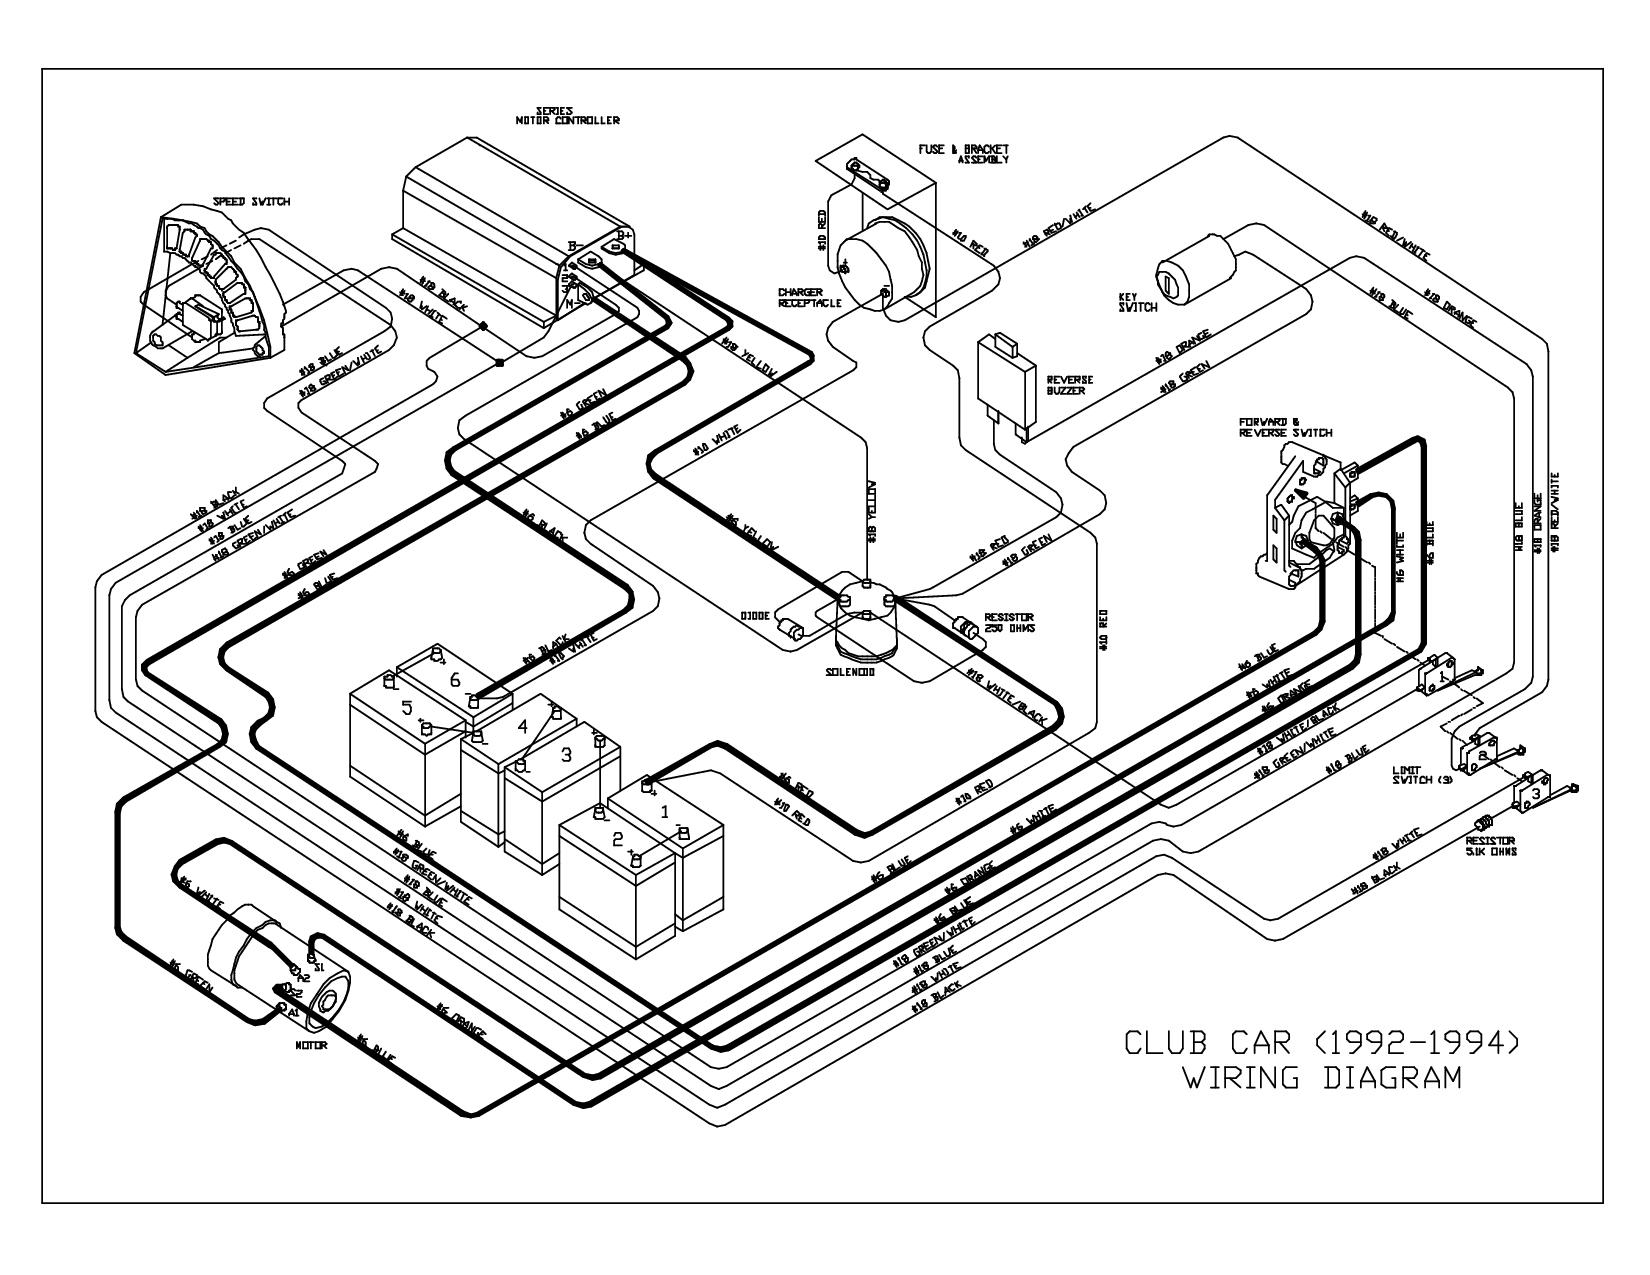 Club Car Wiring Diagram 36 Volt 5A247521D8047 And 91 At Club Car - 36 Volt Golf Cart Wiring Diagram